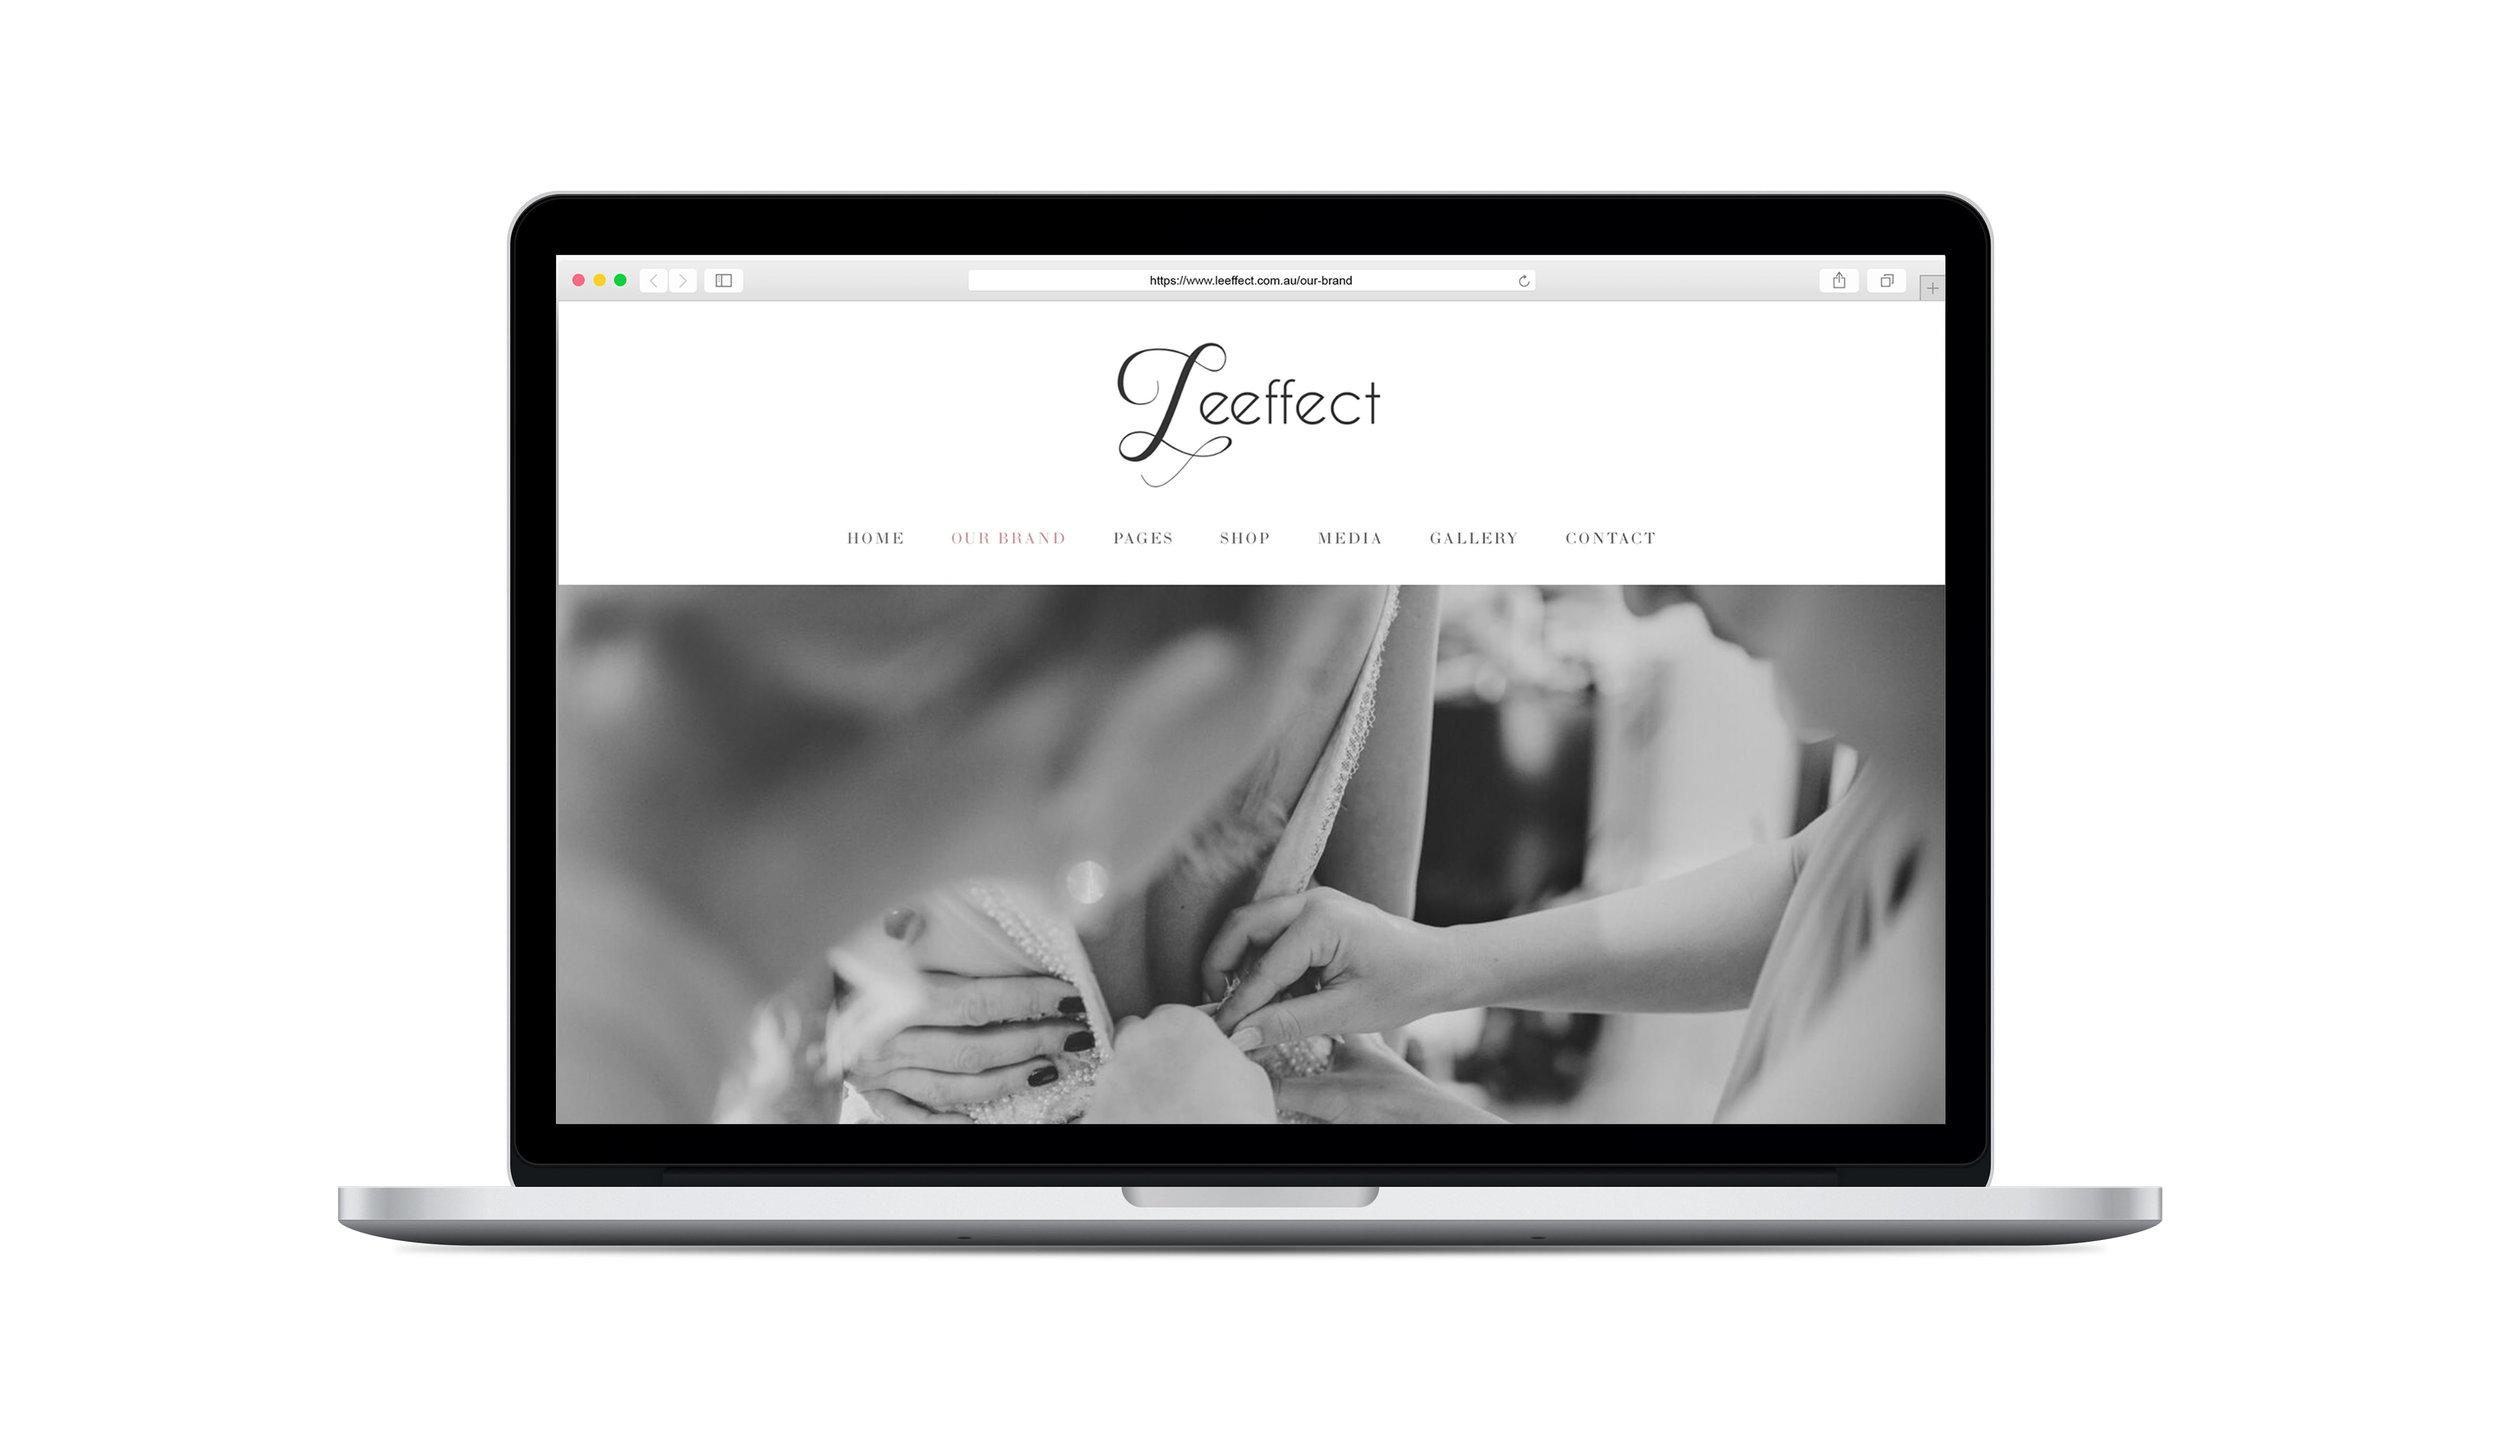 leeffect brand page mockup.jpg